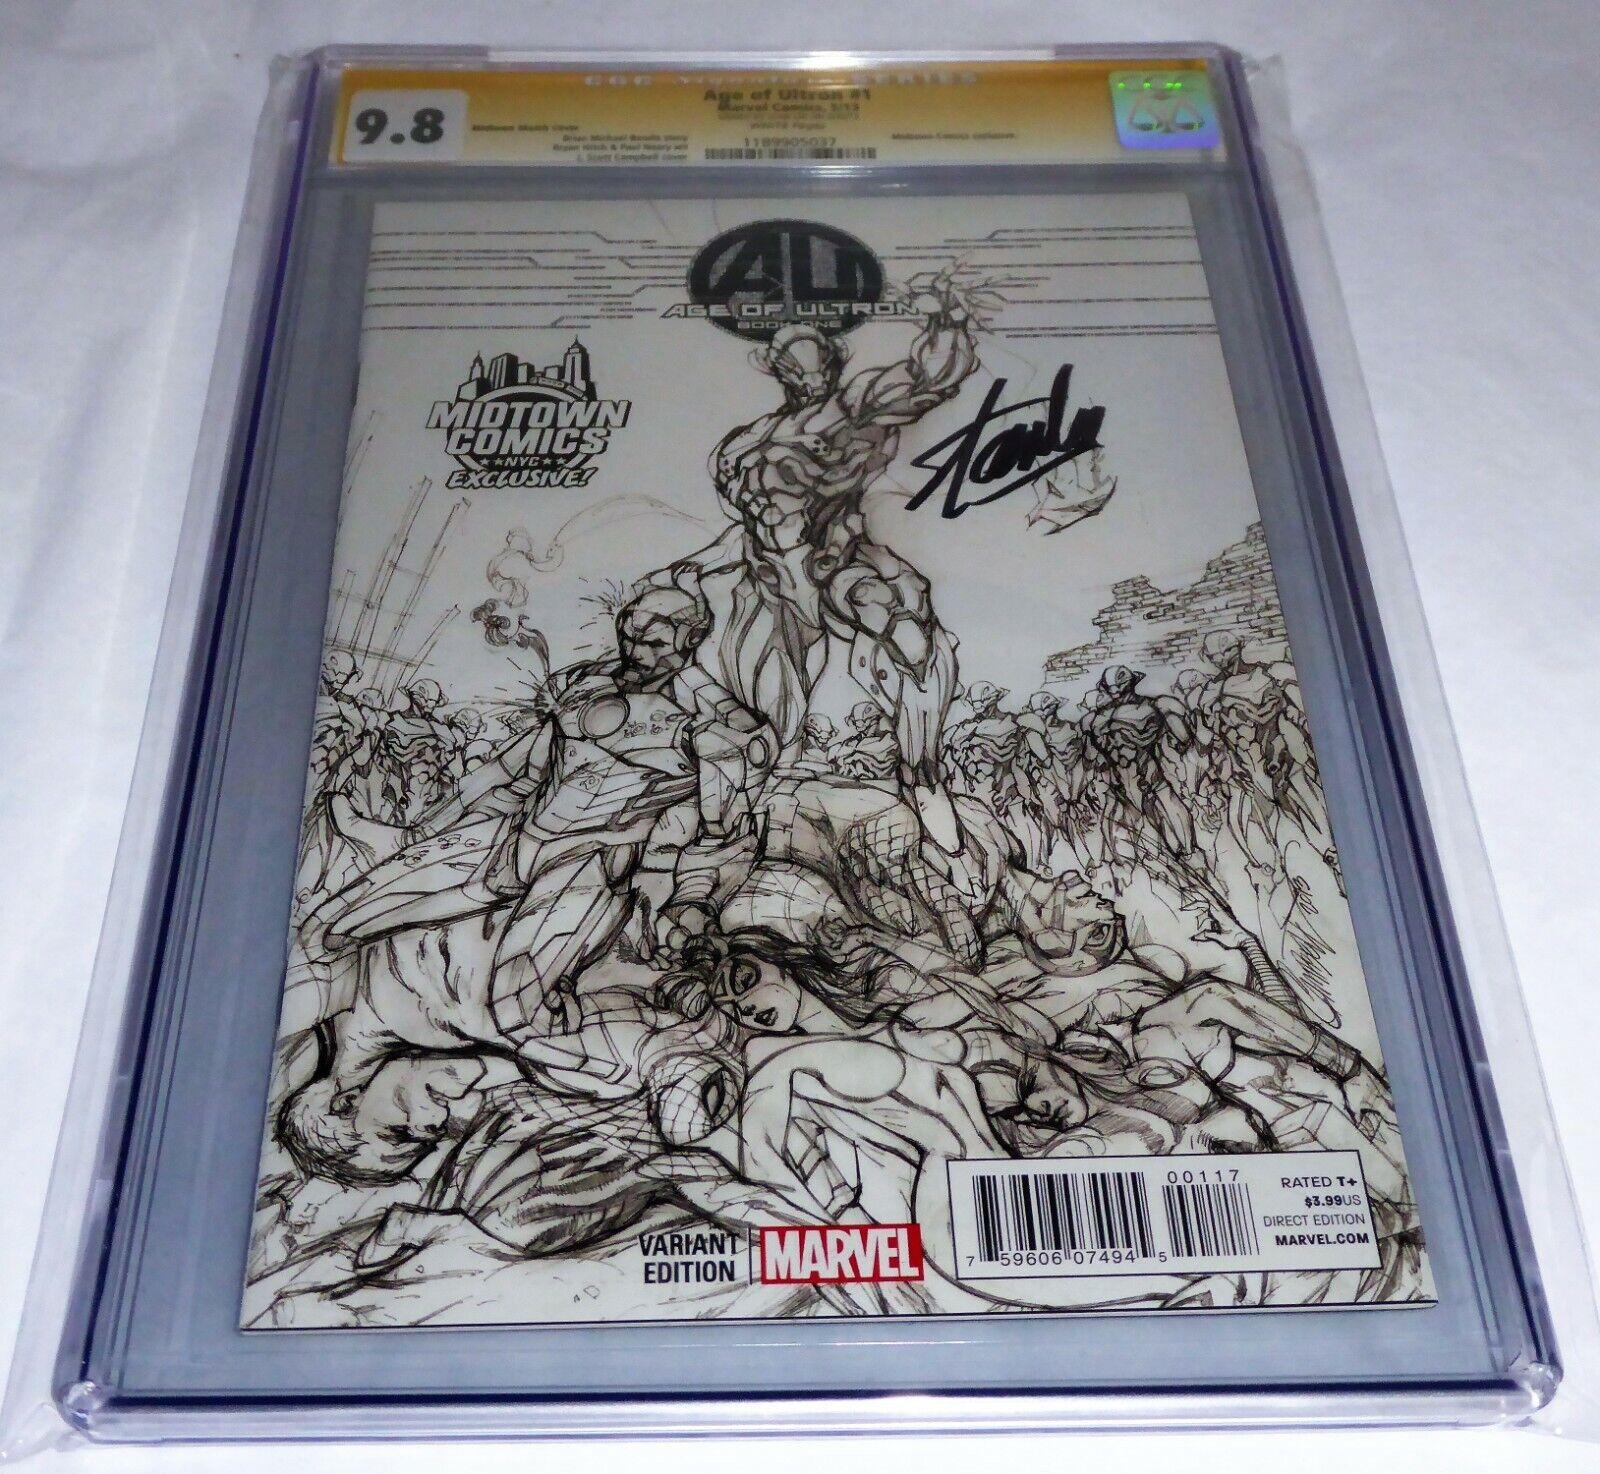 Age of Ultron #1 CGC SS Signature Autograph STAN LEE Midtown Comics 9.8 Sketch